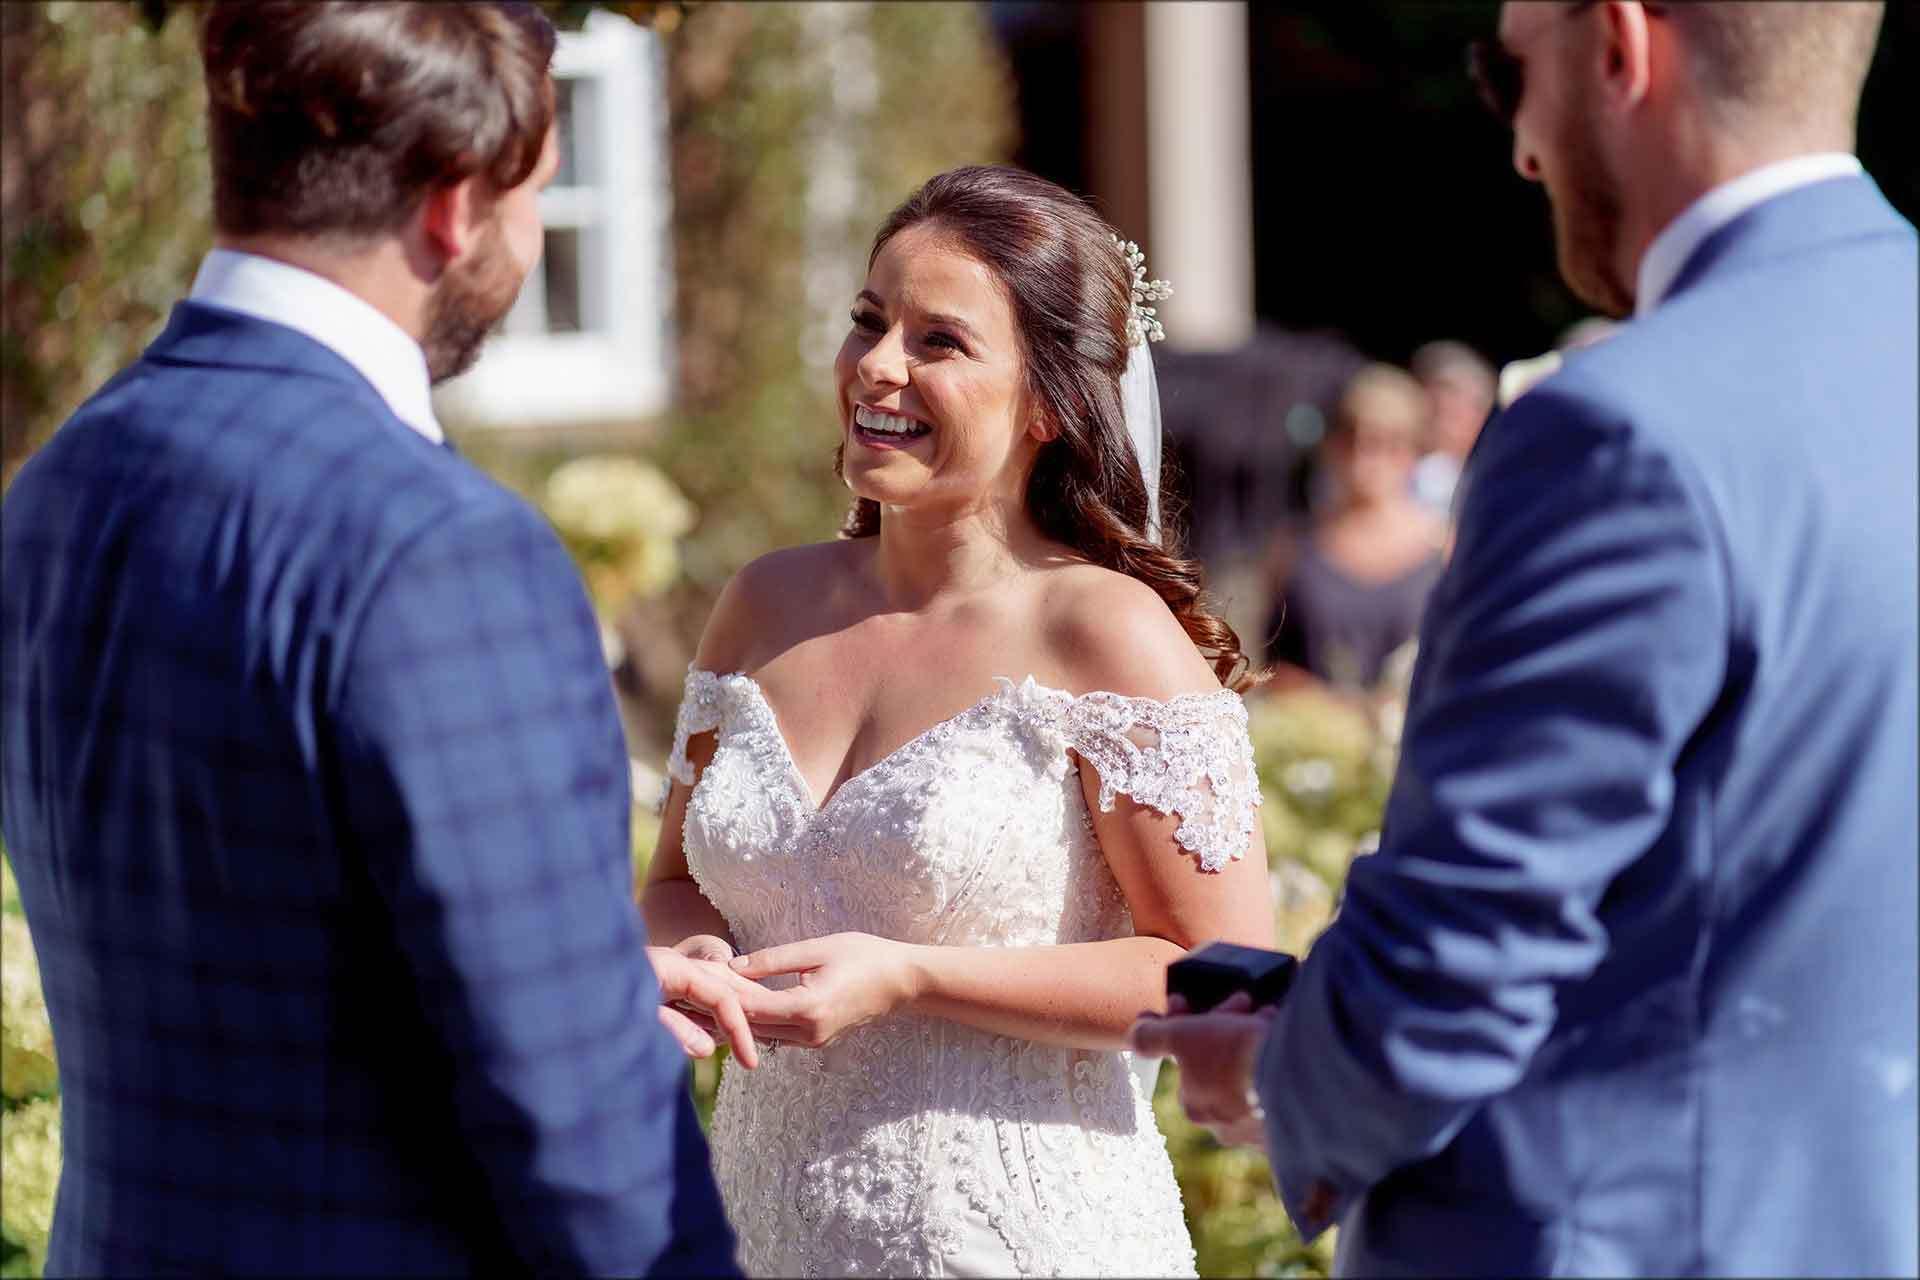 bride putting wedding ring on grooms finger